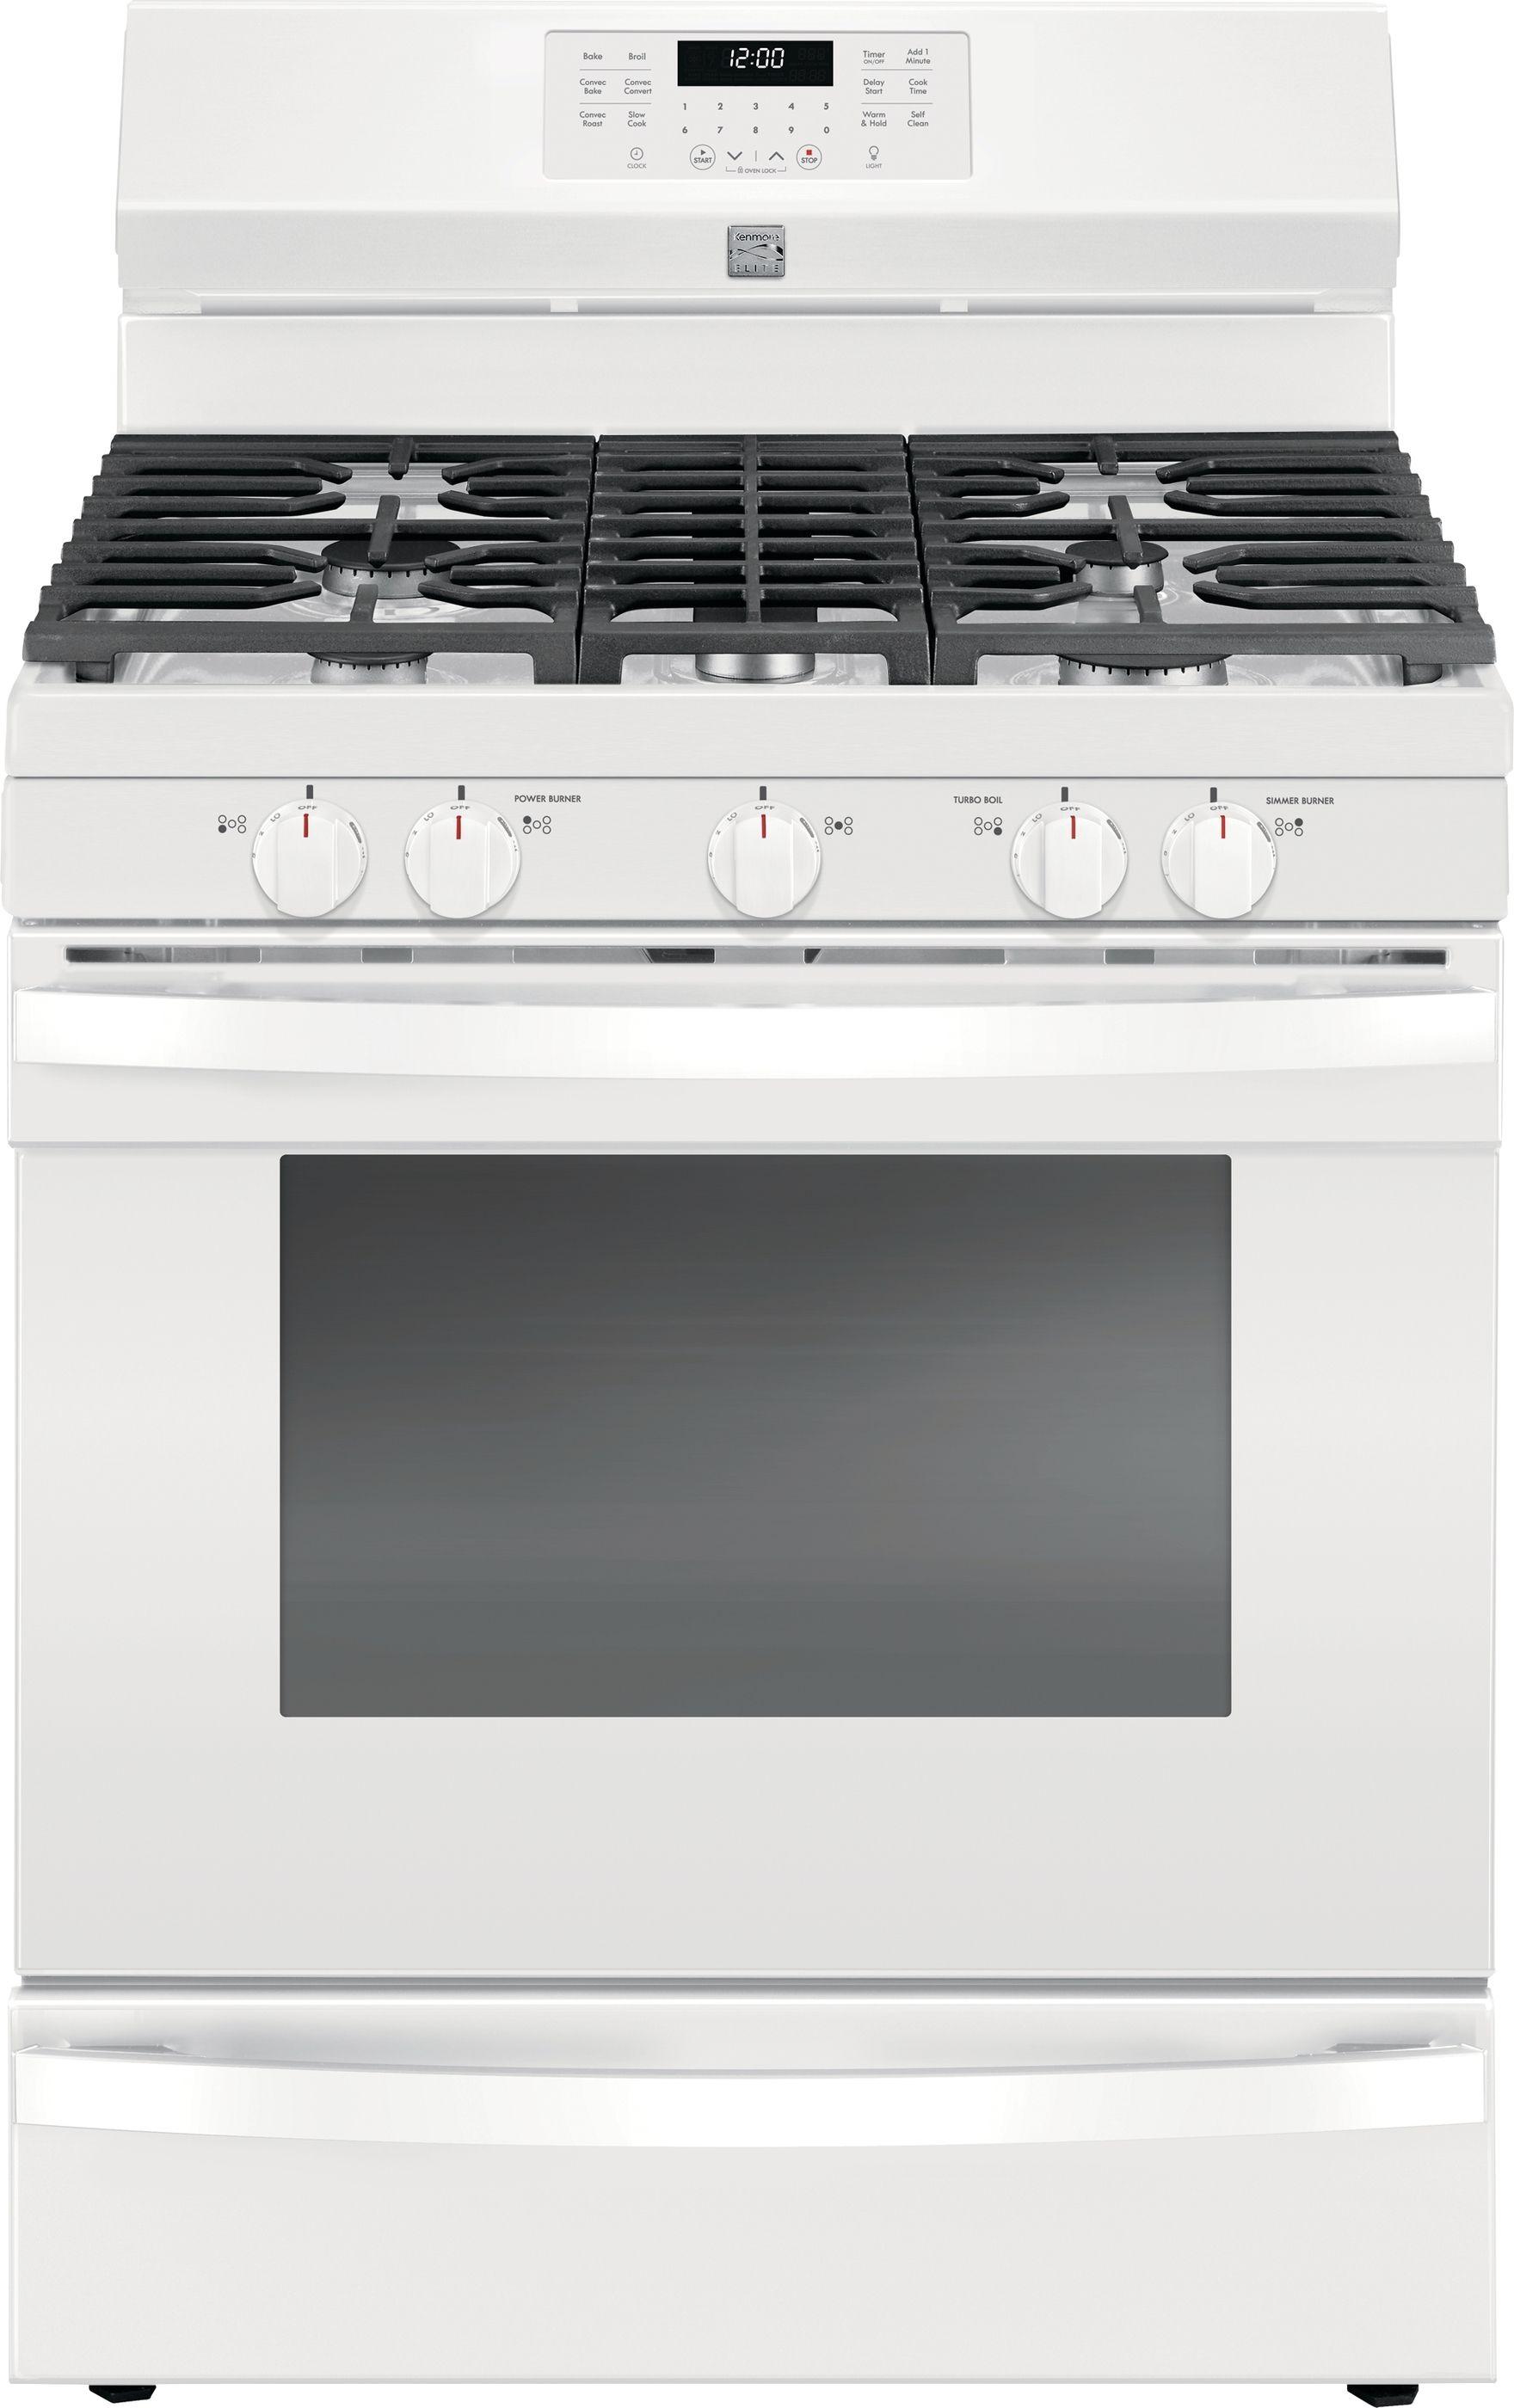 Kenmore Elite 74462 5 6 Cu Ft Gas Range With True Convection White Kenmore Elite Kitchen Appliances Kitchen